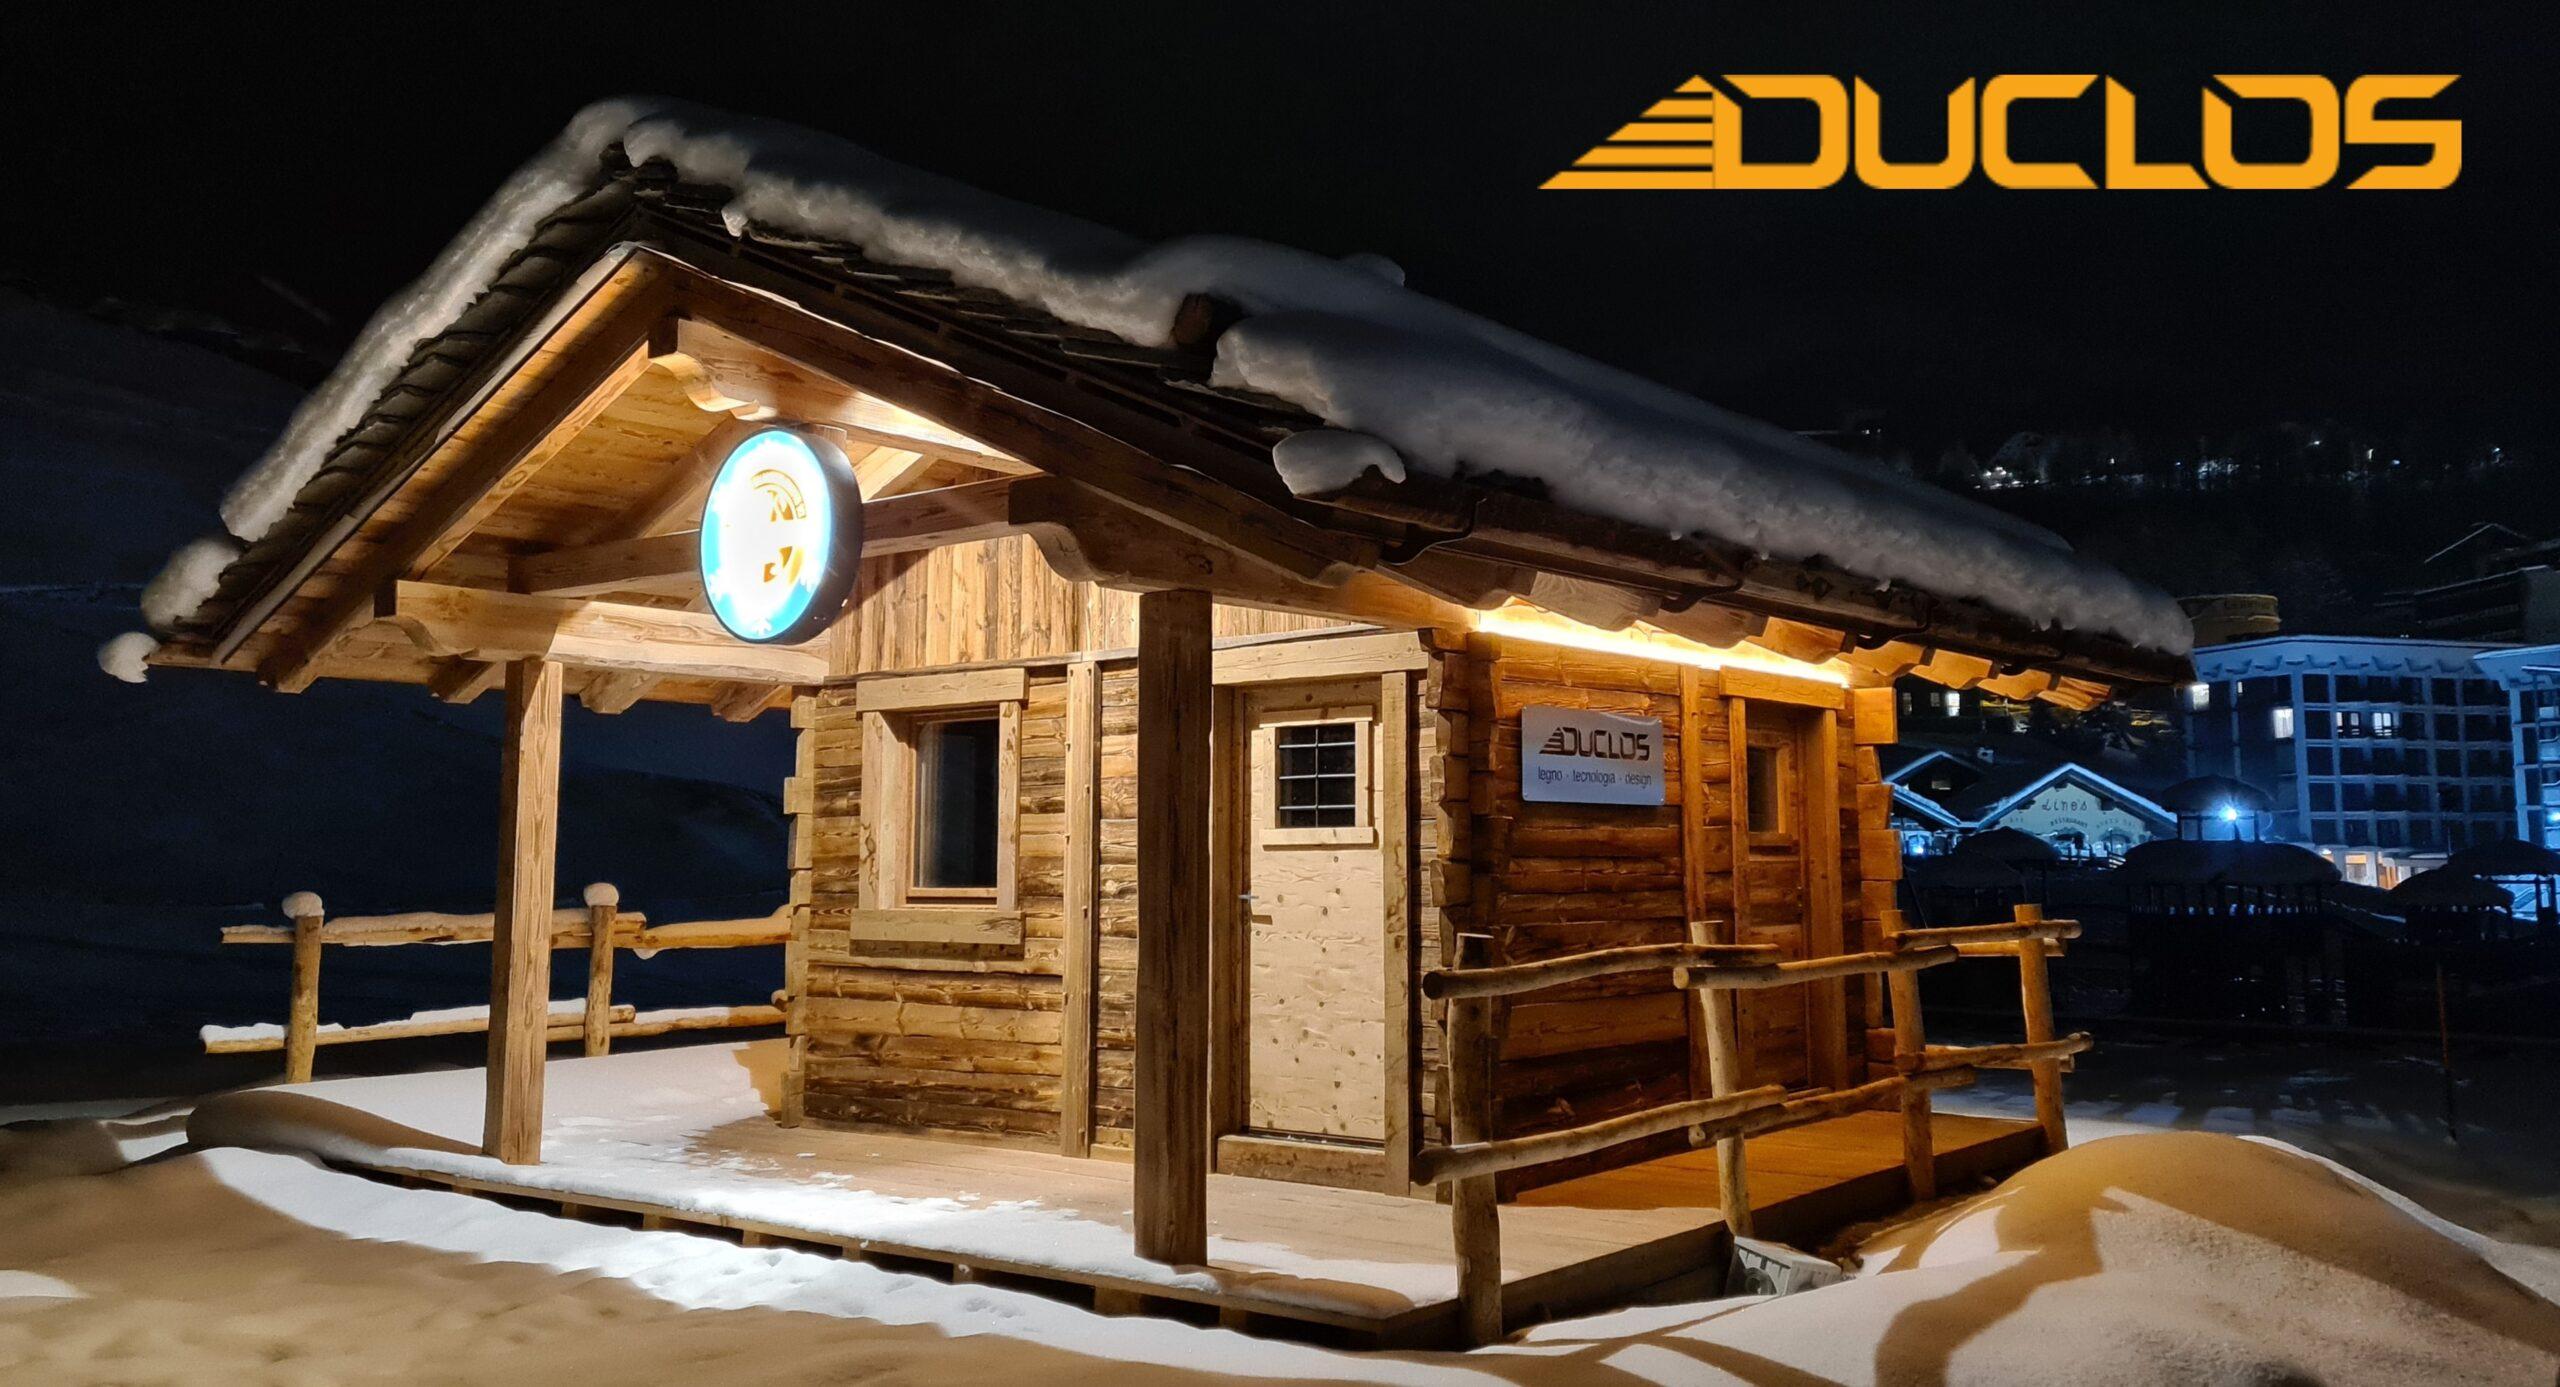 Duclos legnostrutture